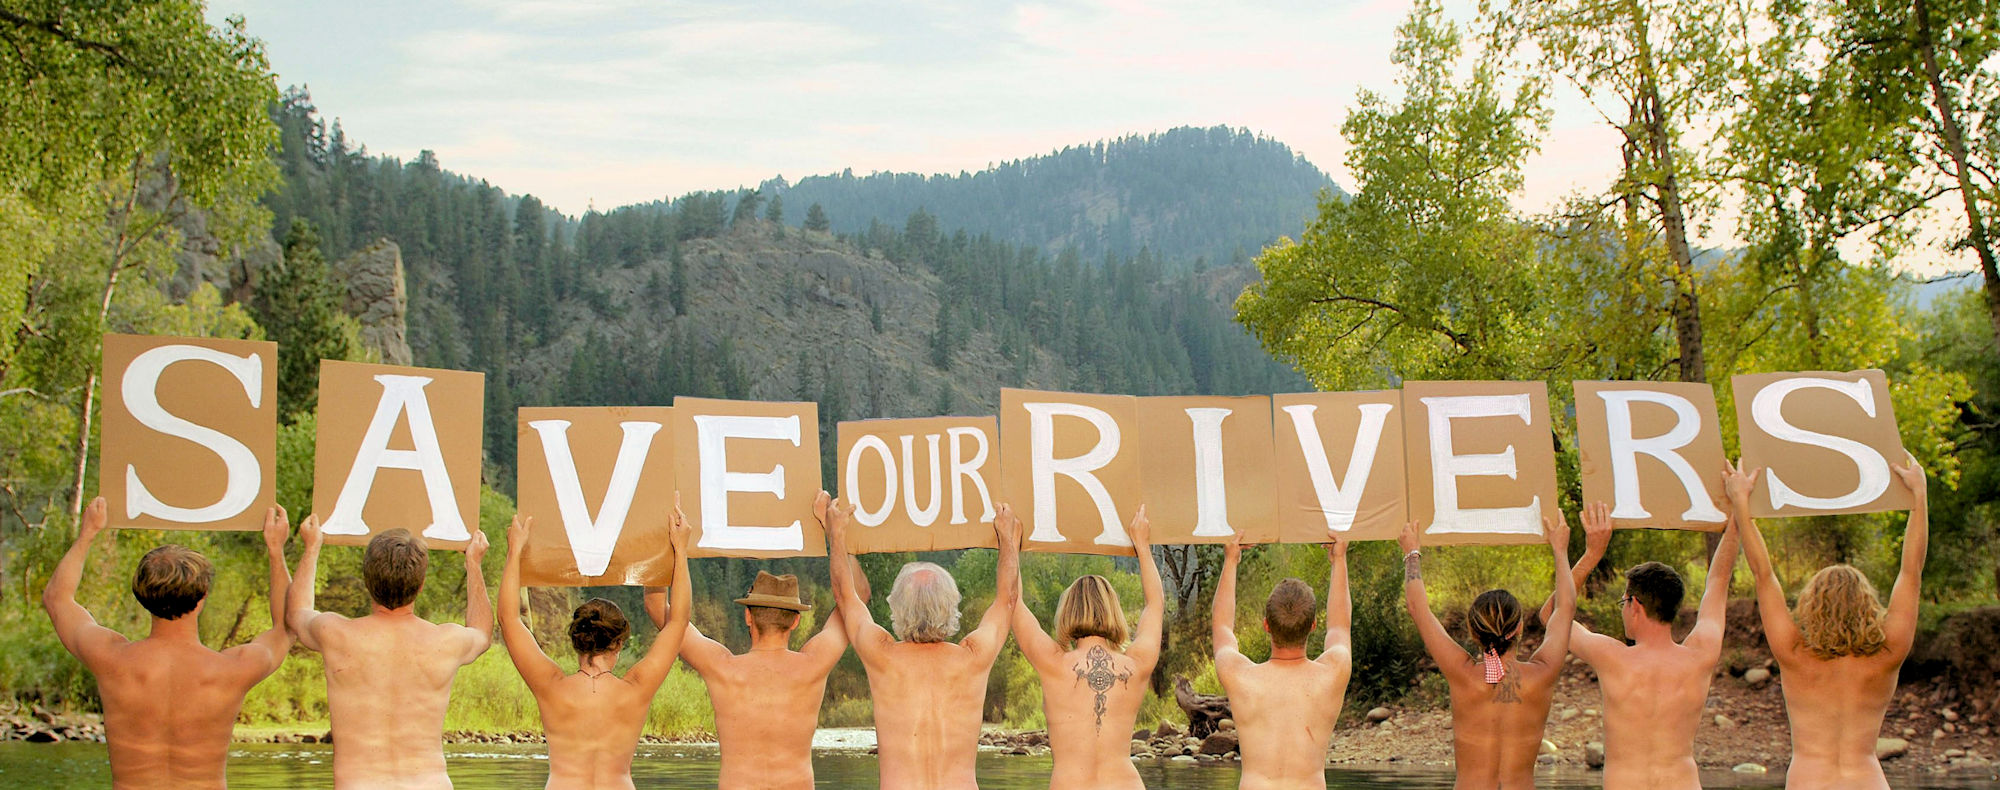 Save-Our-Riversswtr-banner1